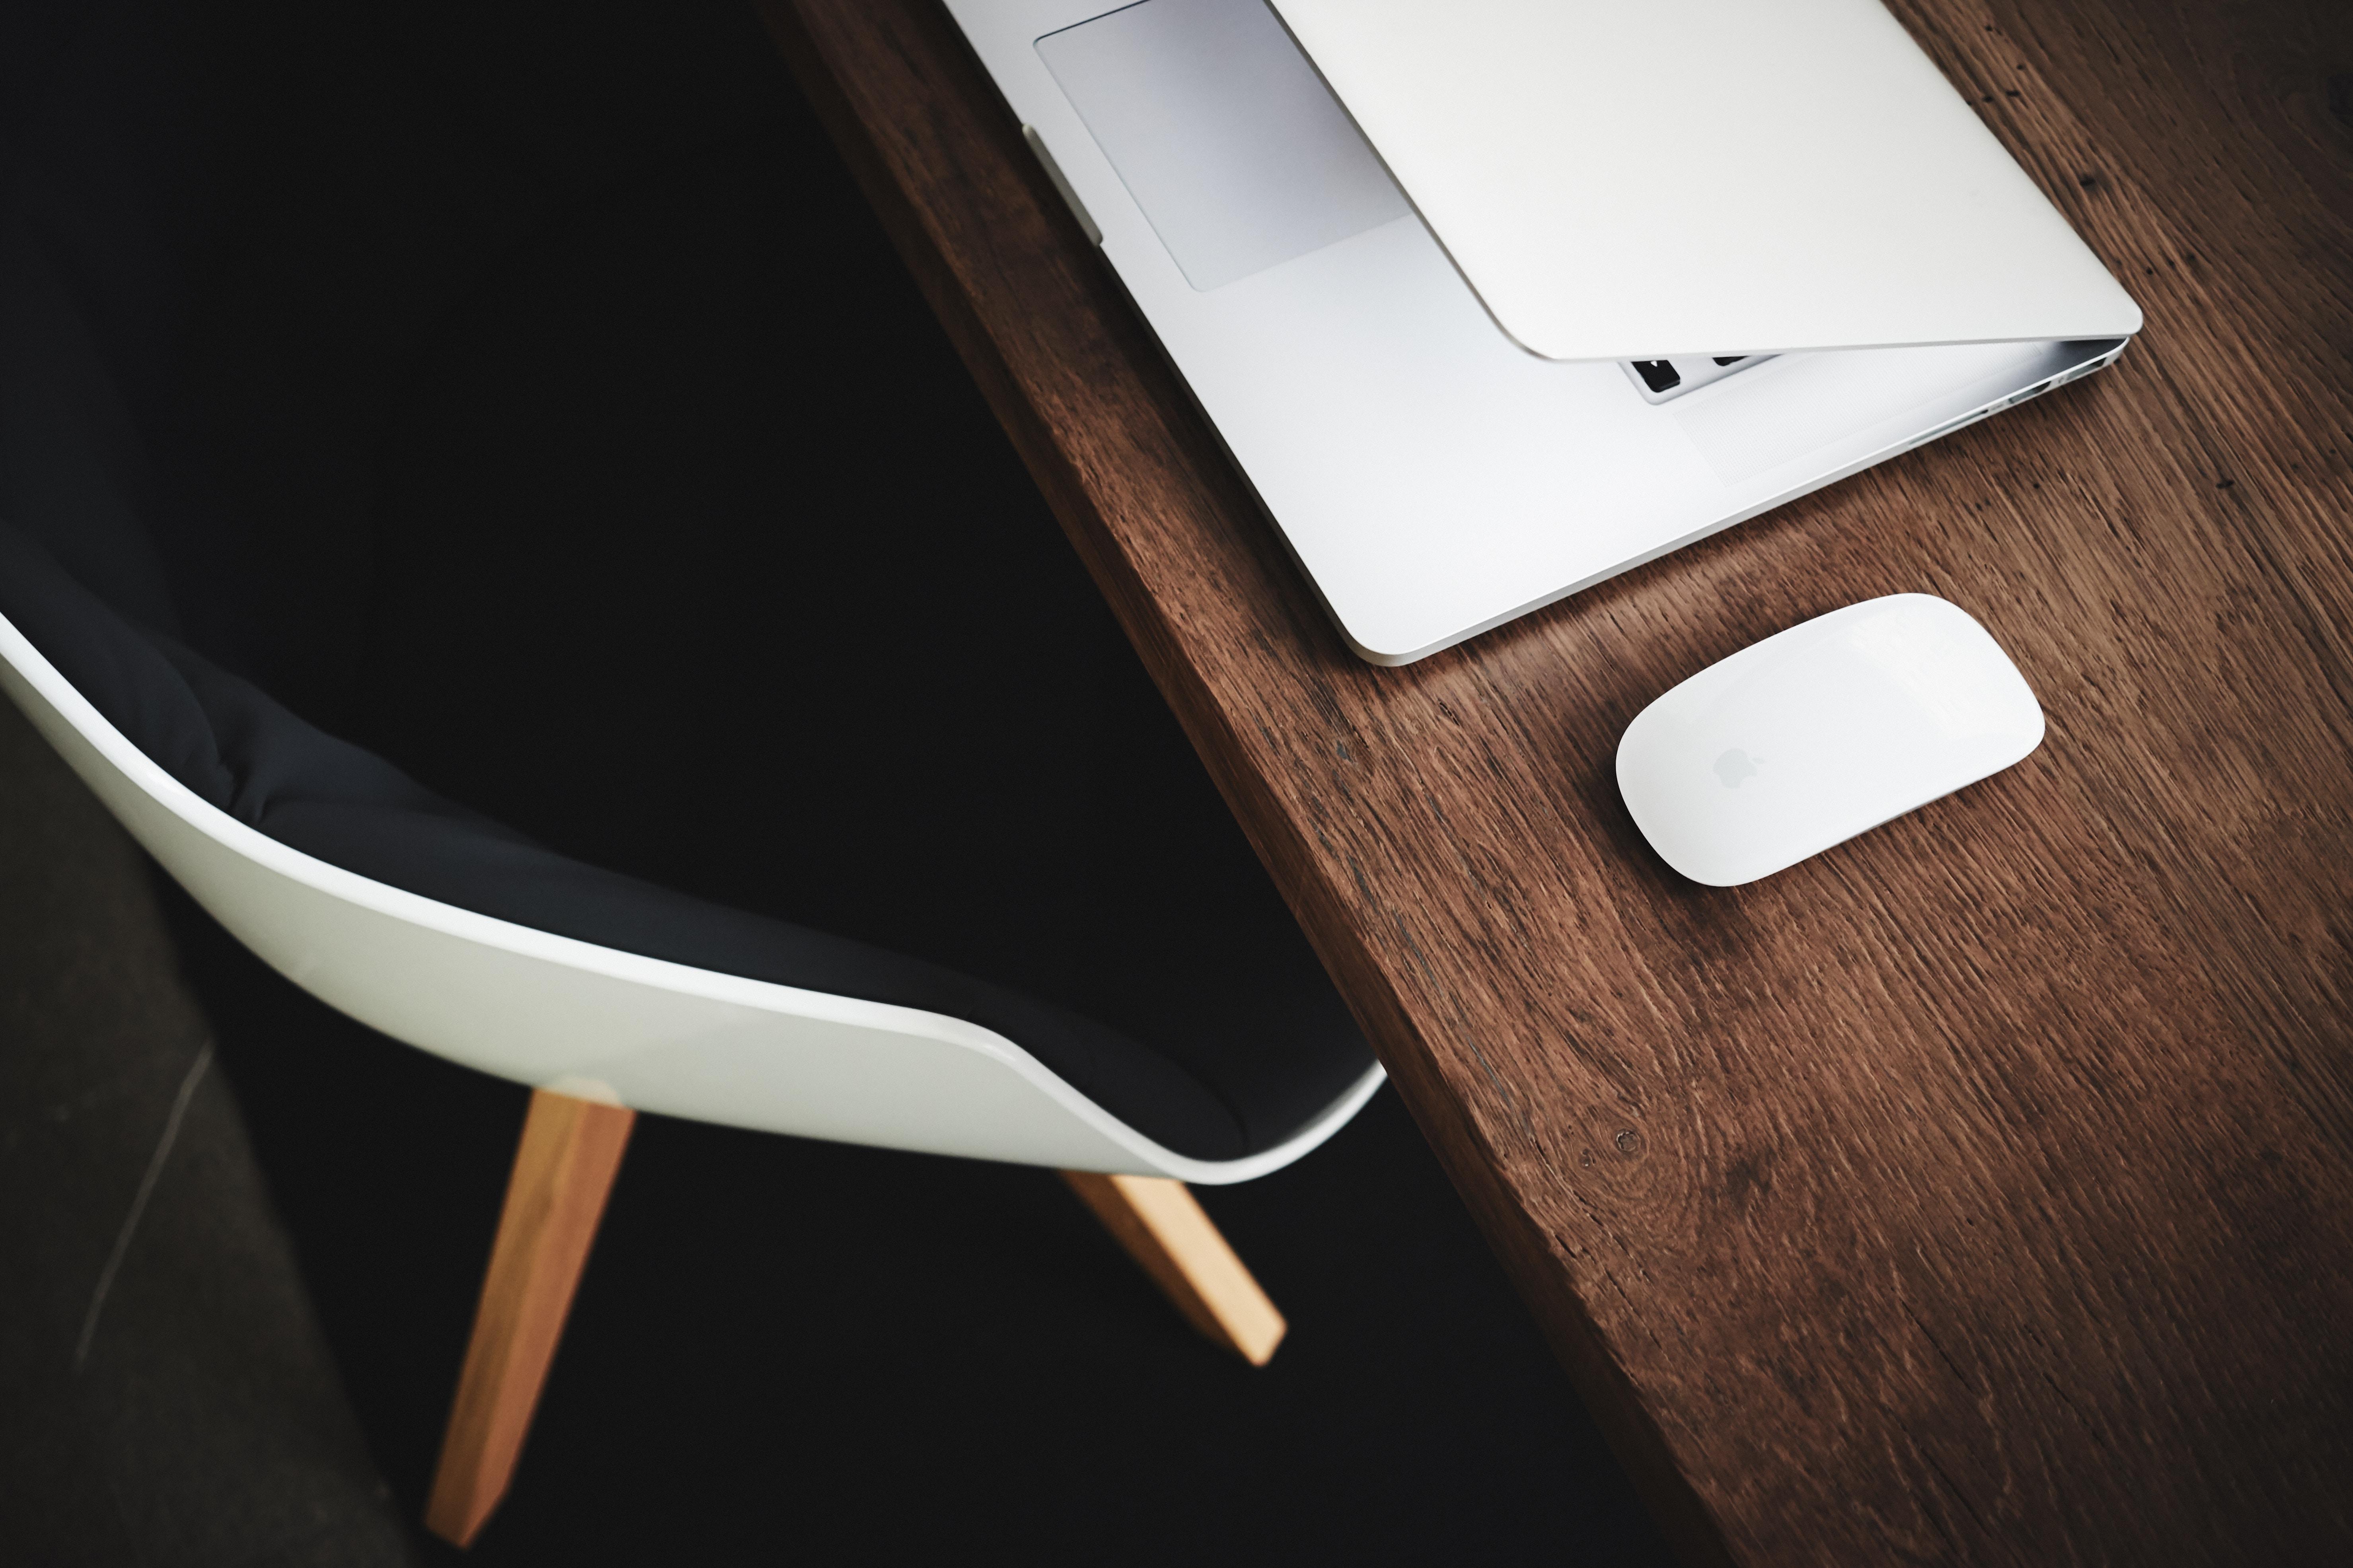 venture capital erfahrungsberichte praktikum